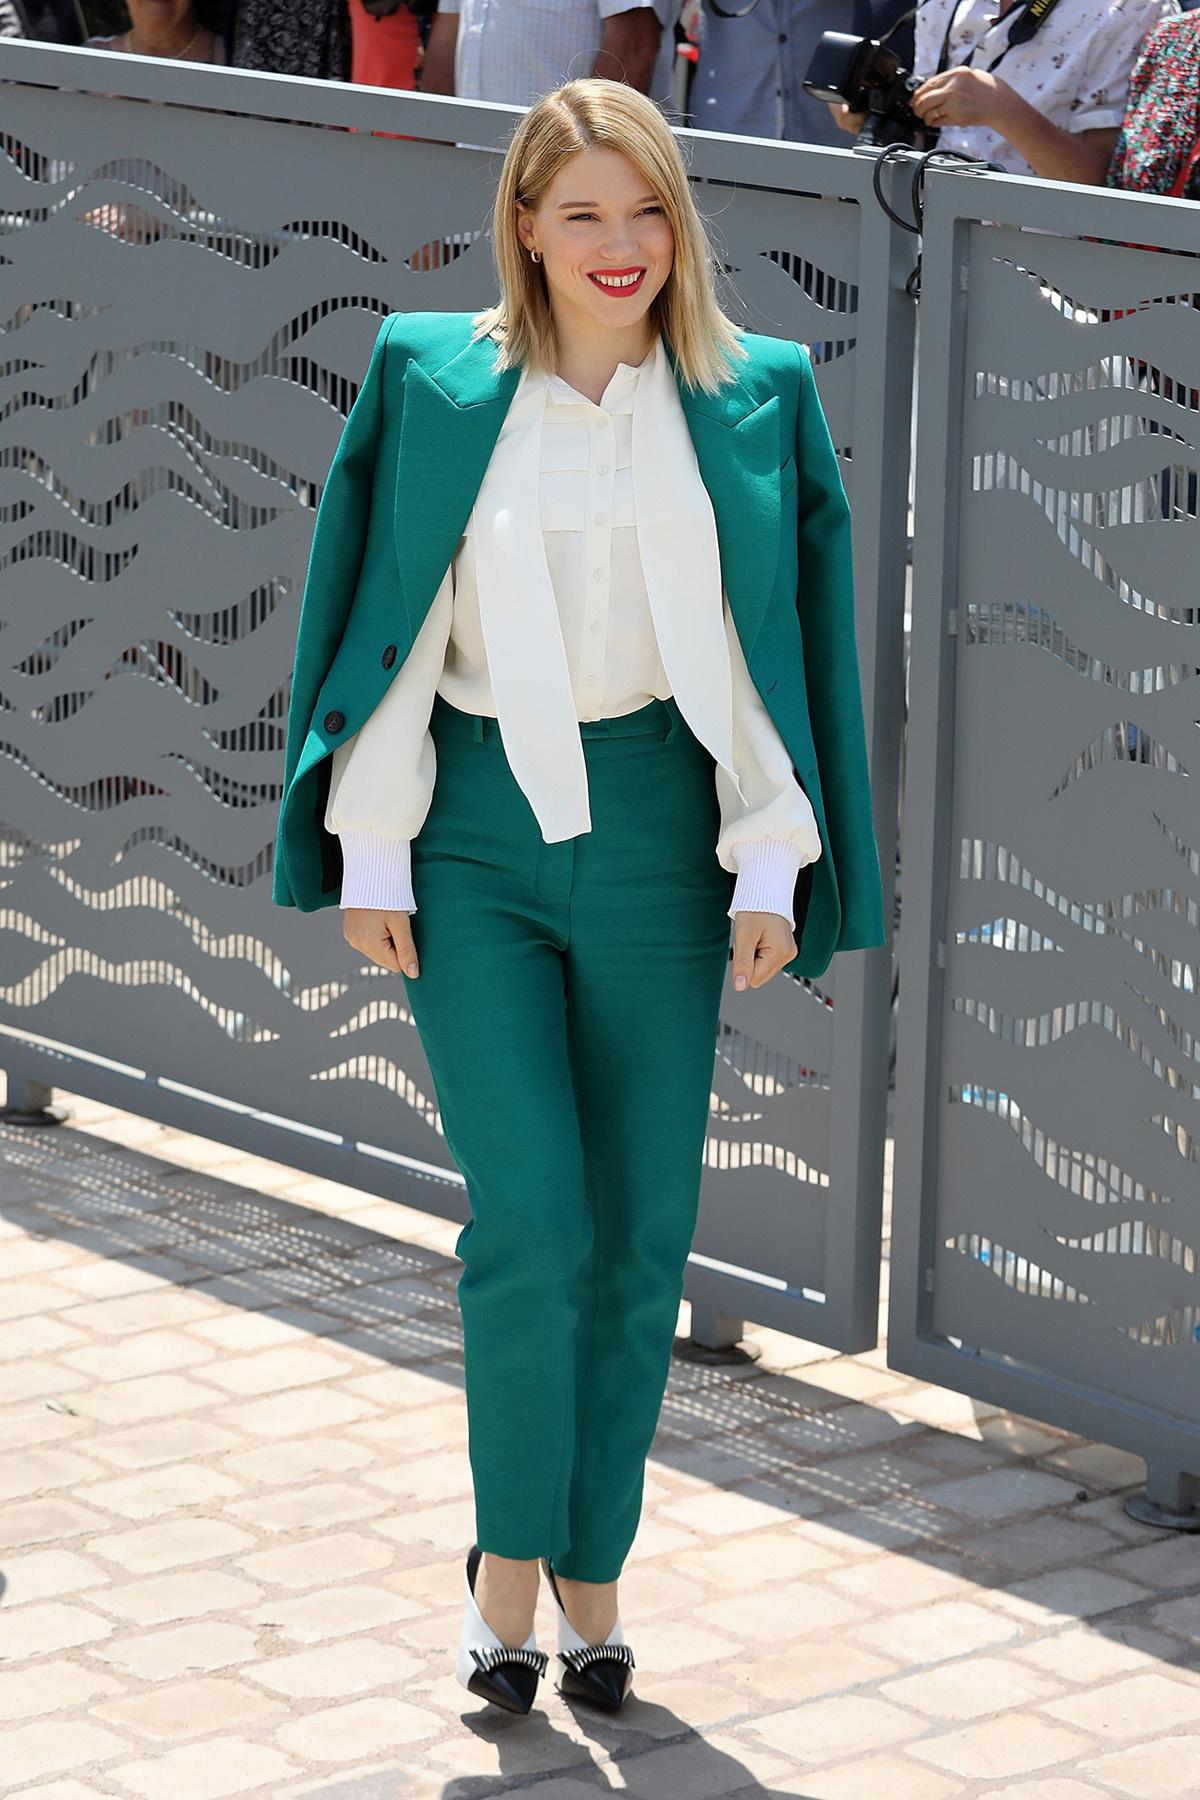 trajes_femeninos_pantalones_tendencia_verano_2018__45131139_1200x1800